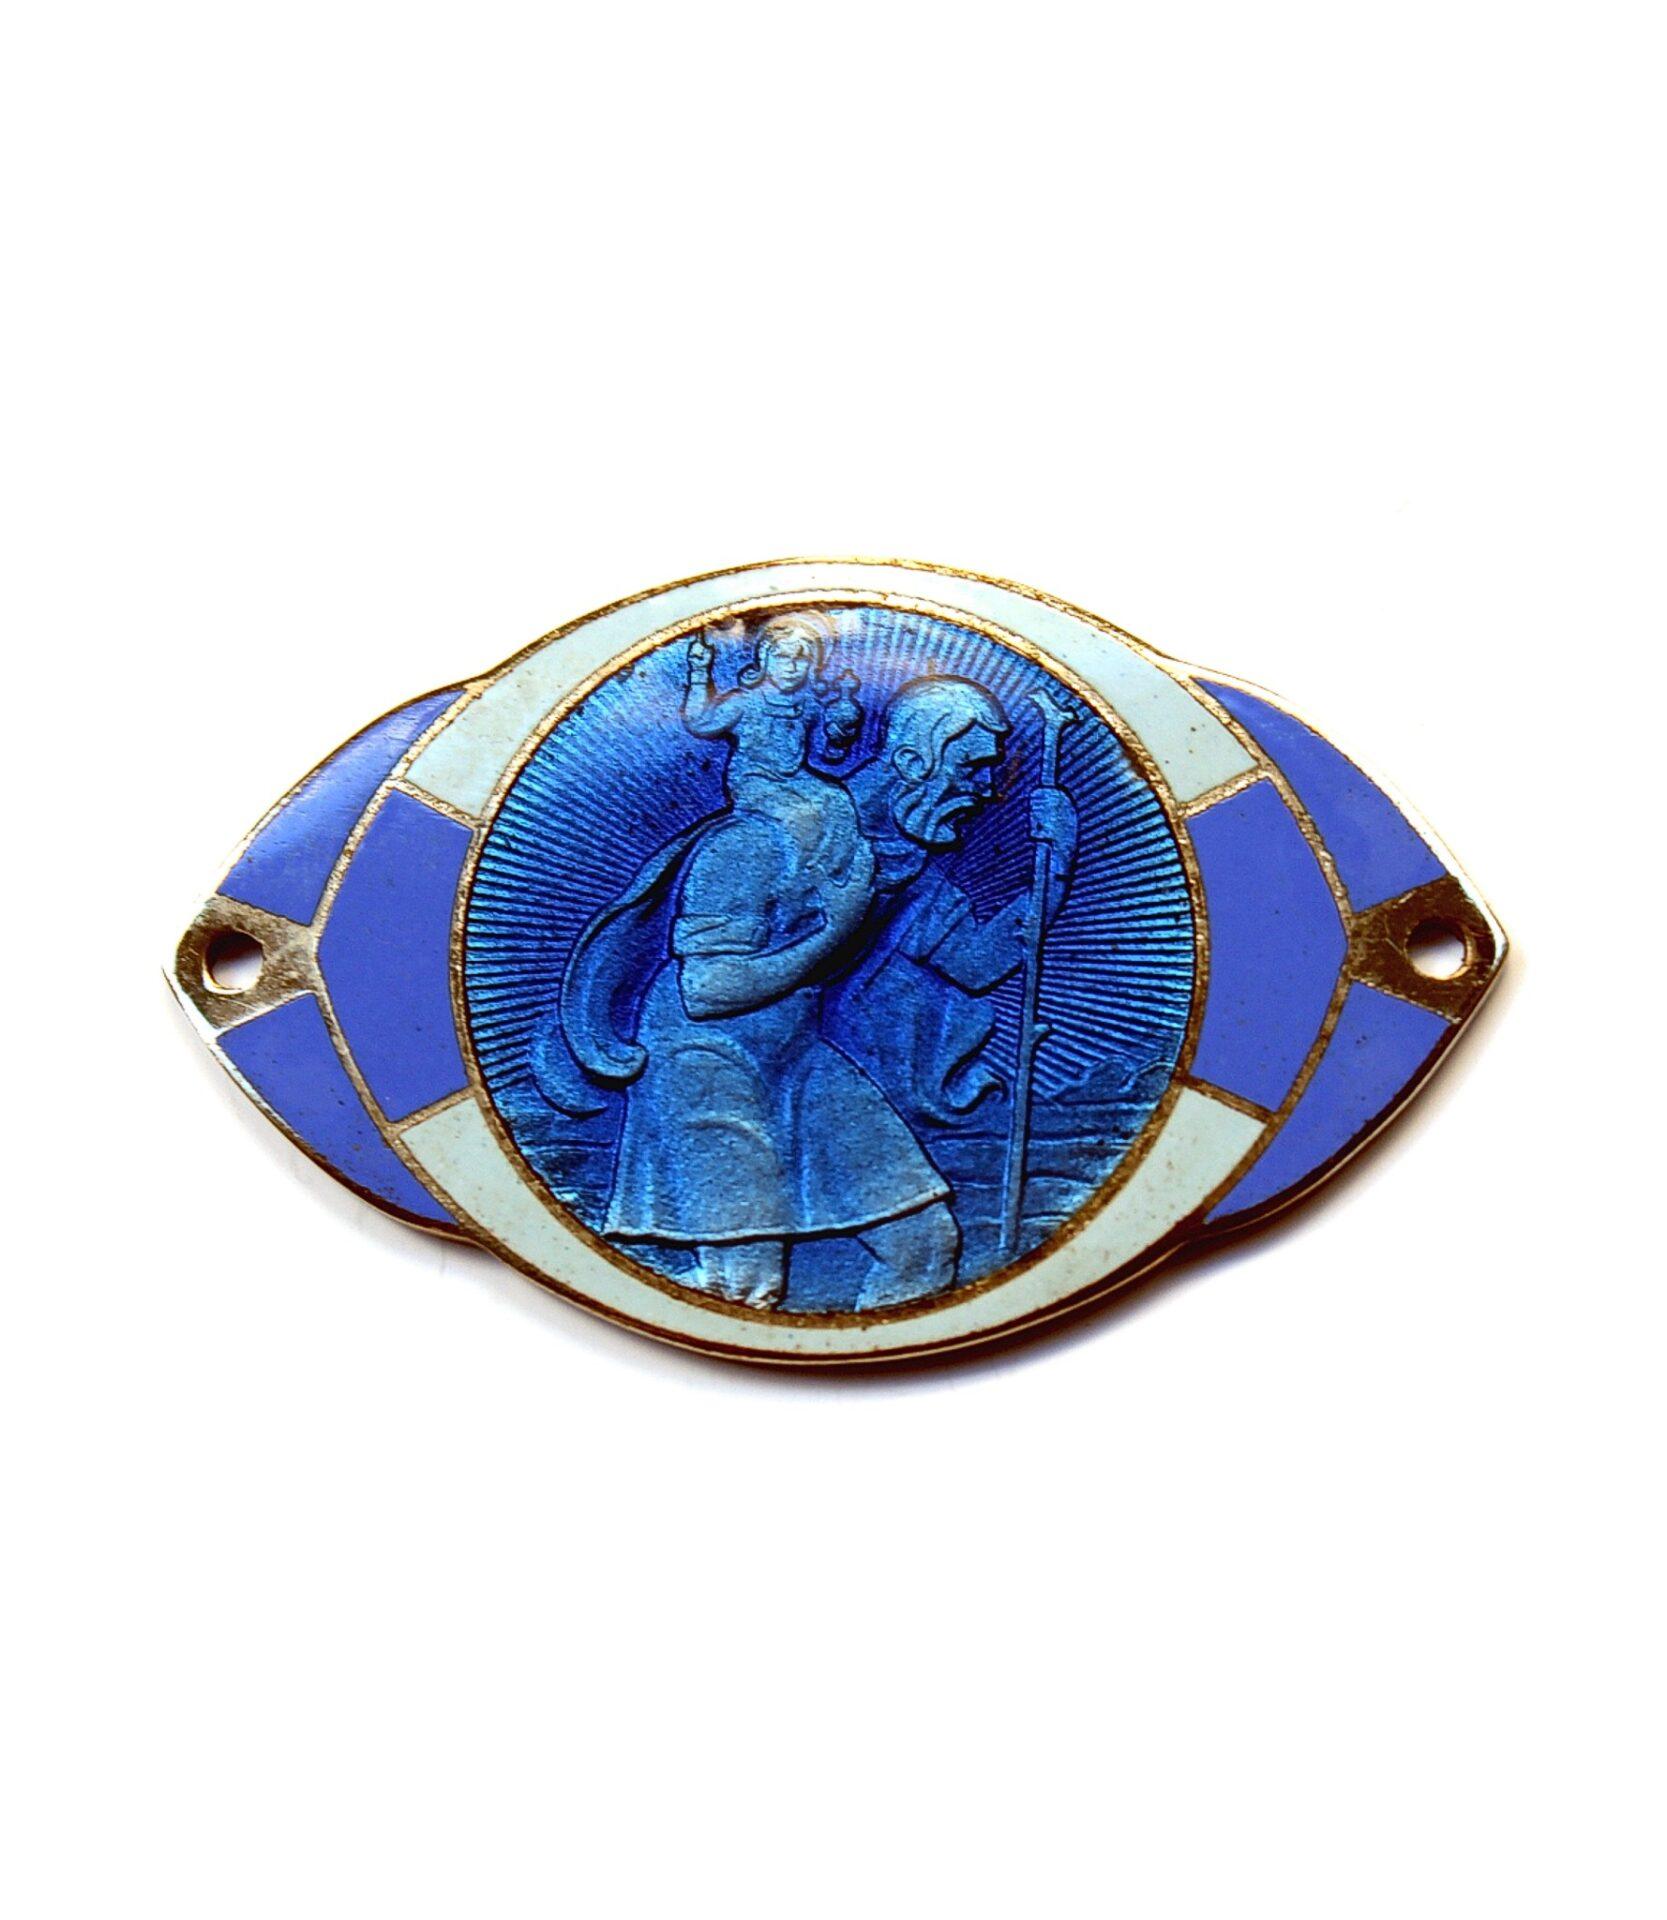 Enameled St.Christopher badge for sale